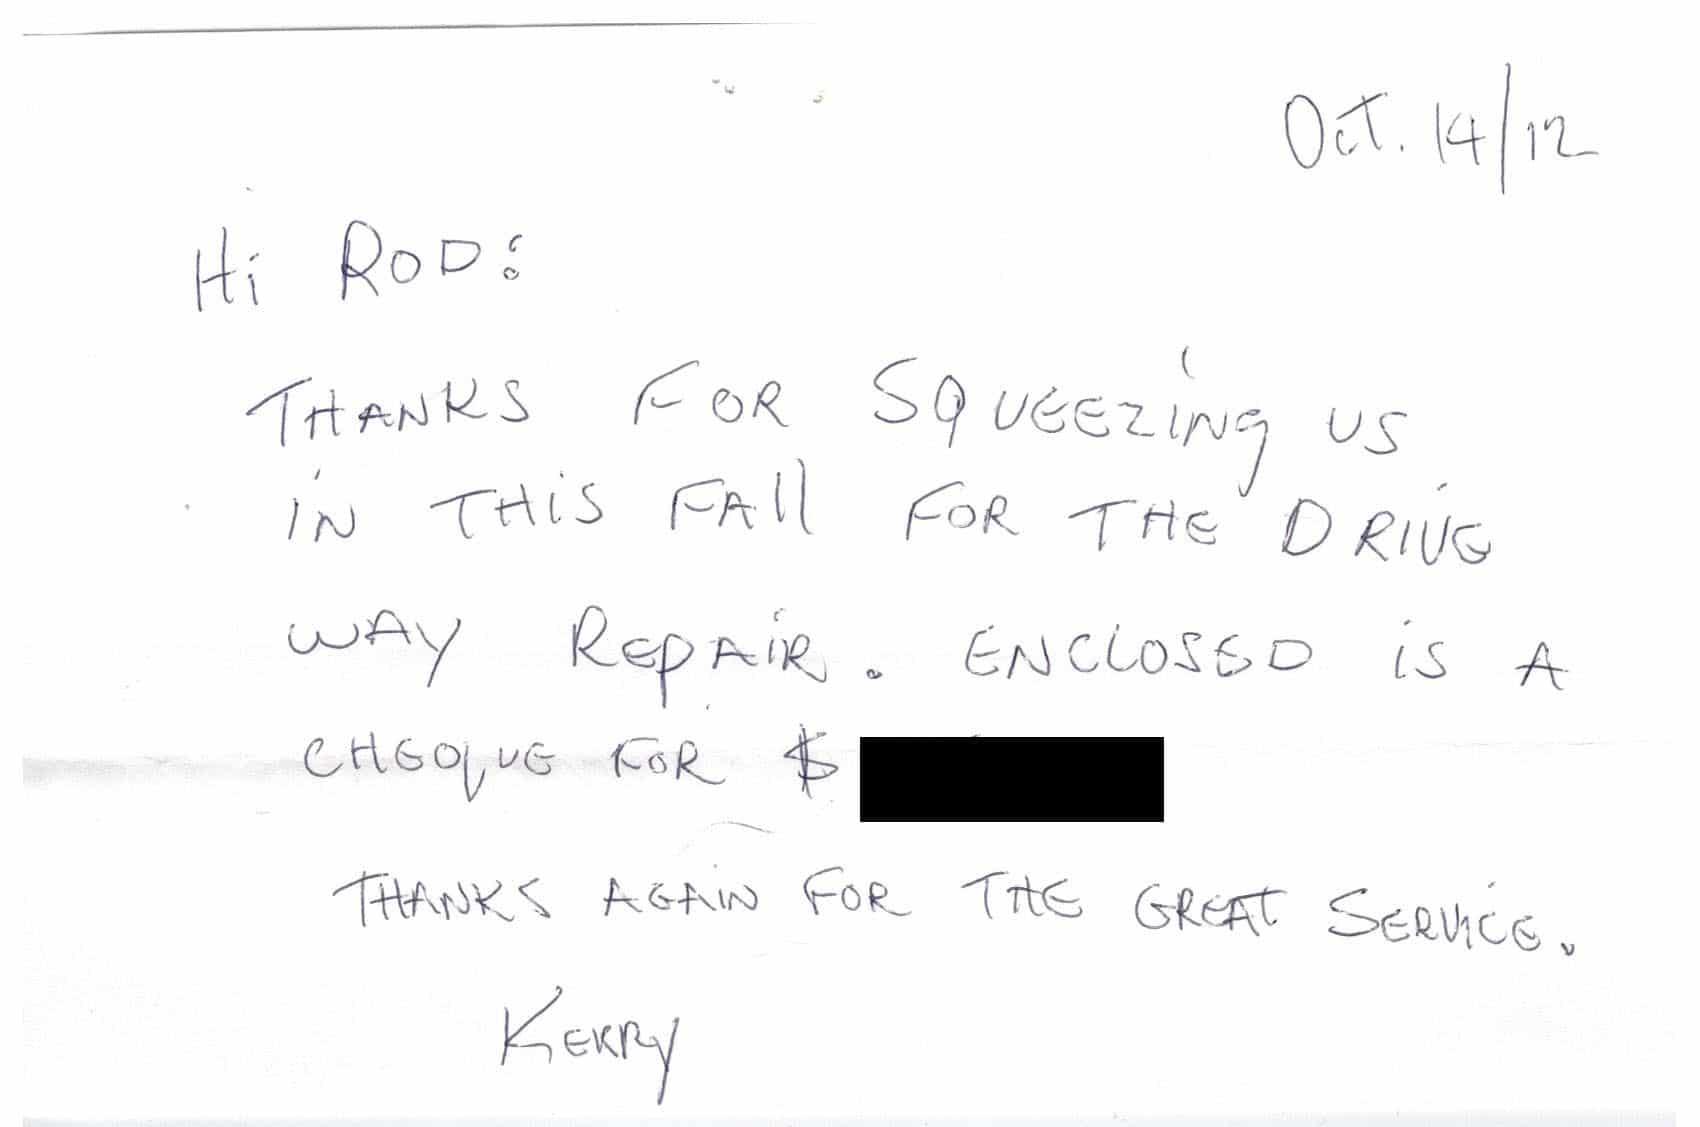 Kerry, October 14, 2012